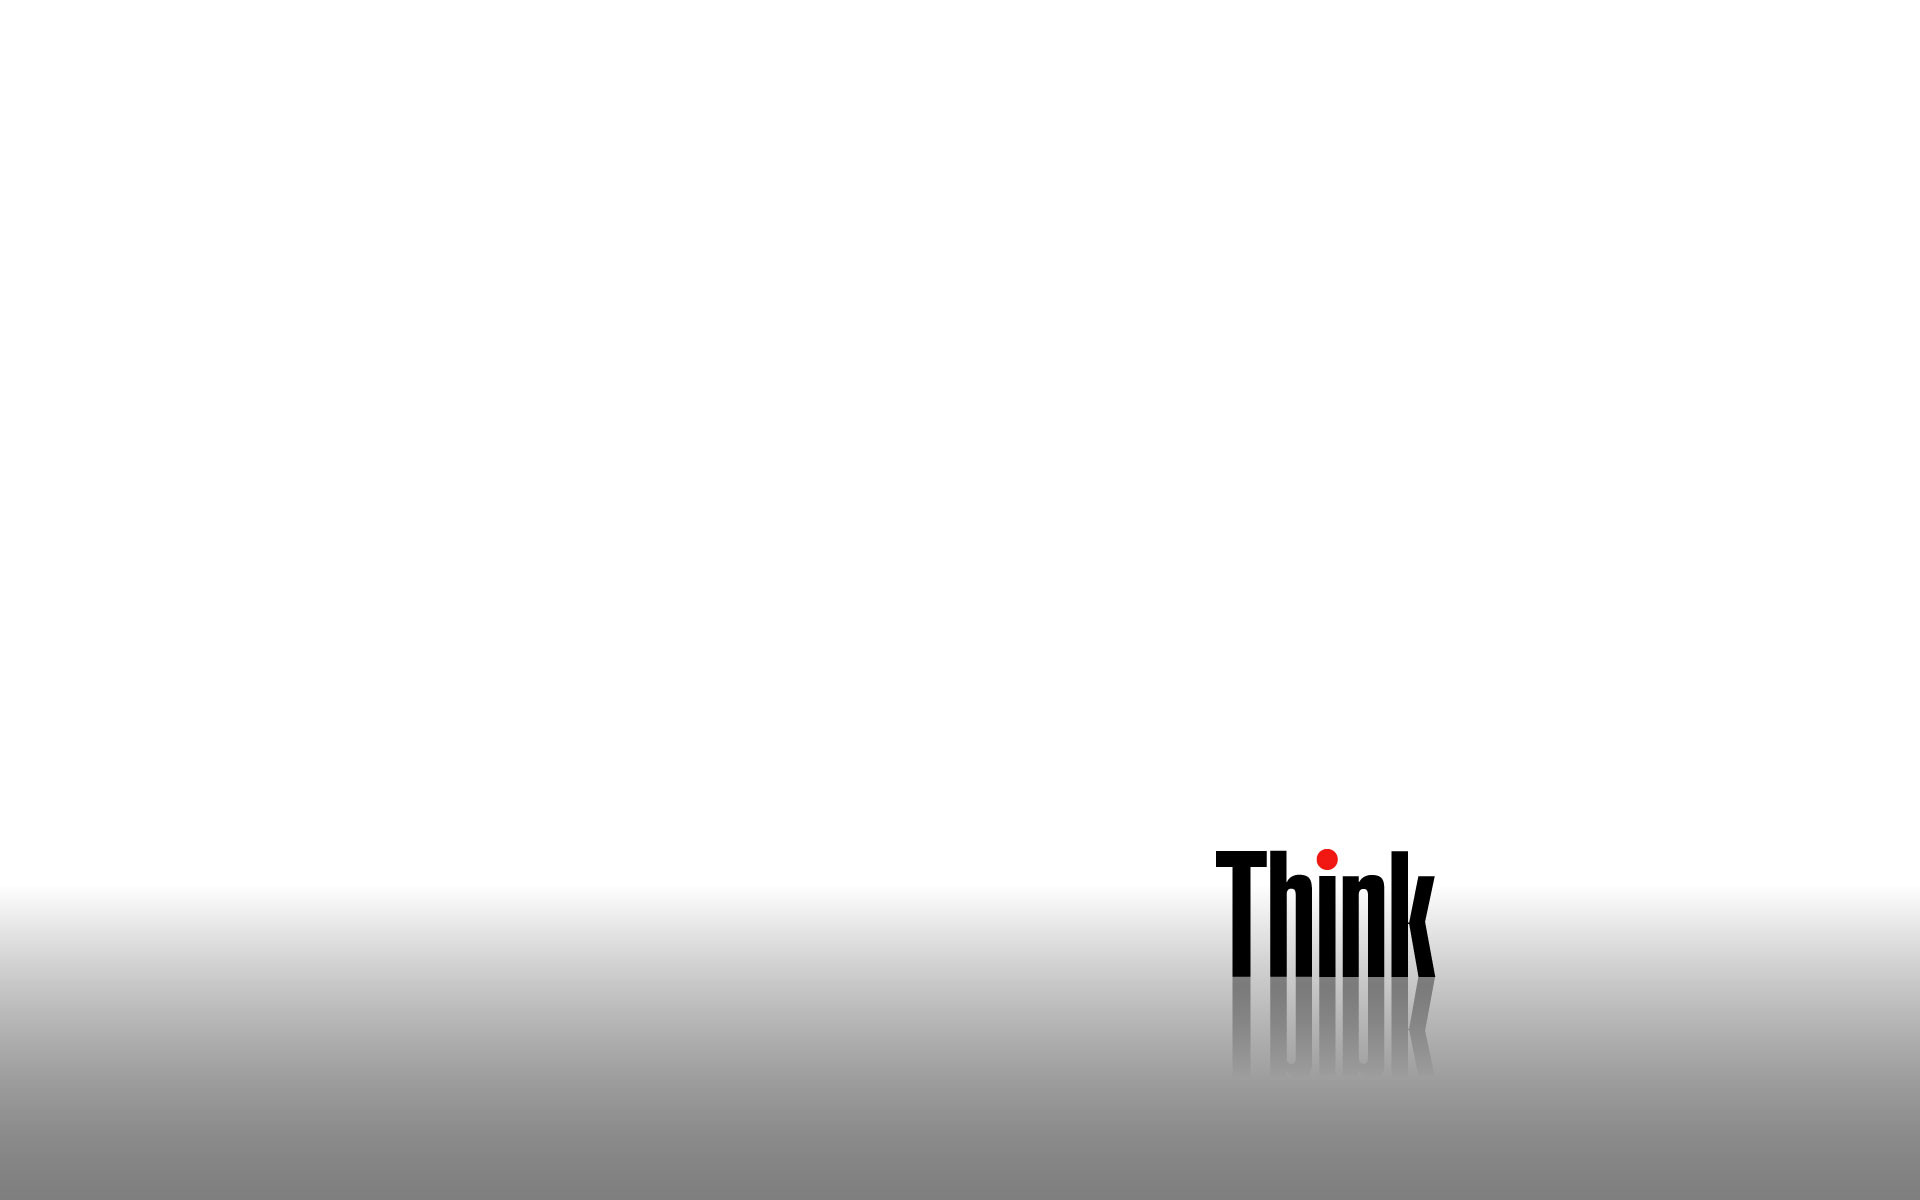 Free Lenovo Thinkpad Image Download.